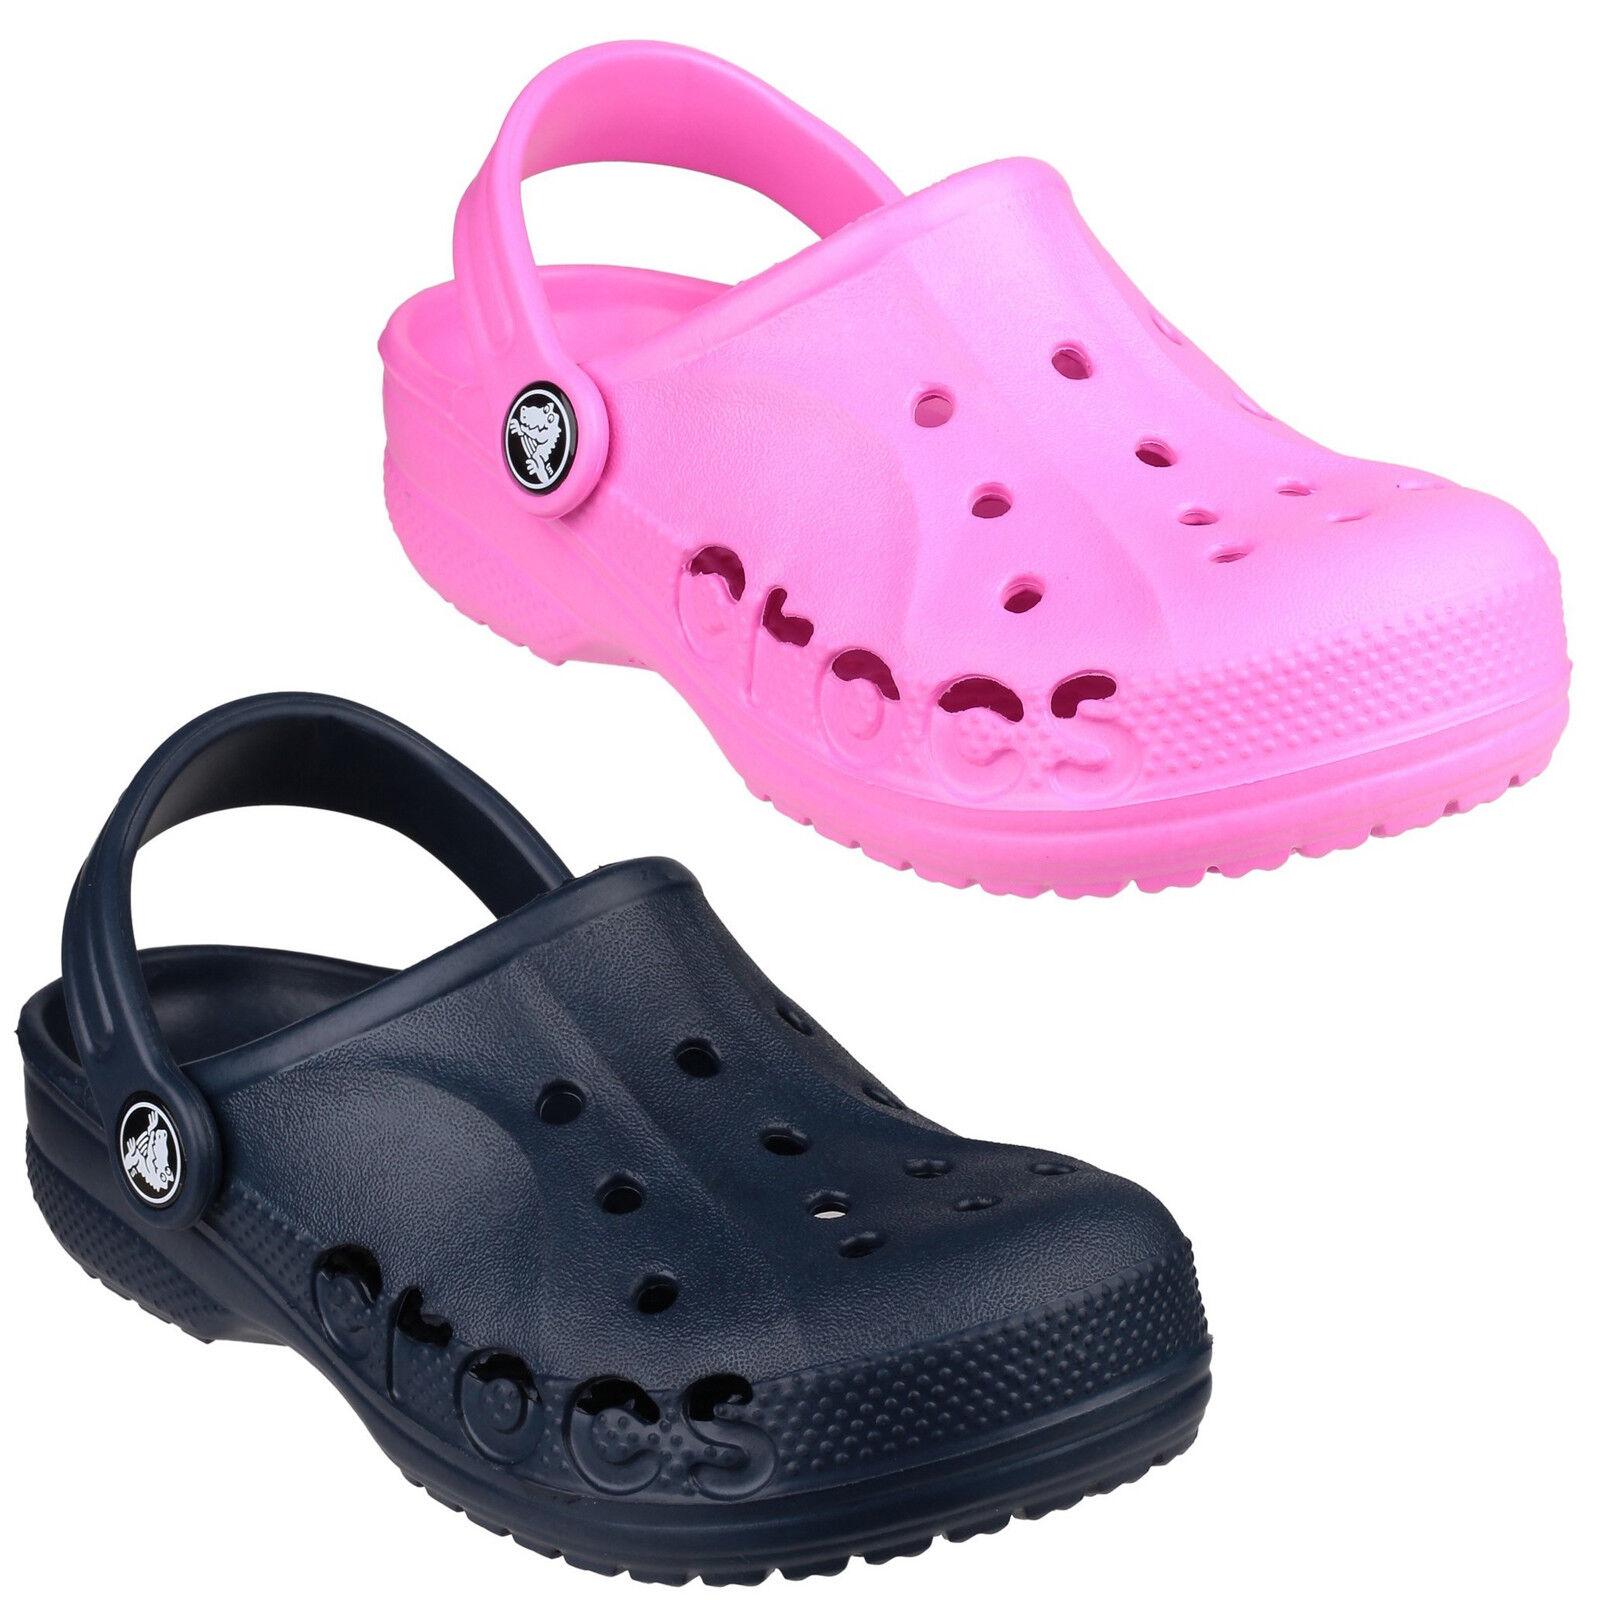 outlet store e22a4 321fd Details about Crocs Baya Clogs Childrens Croslite Lightweight Kids Boys  Girls Shoes Sandals